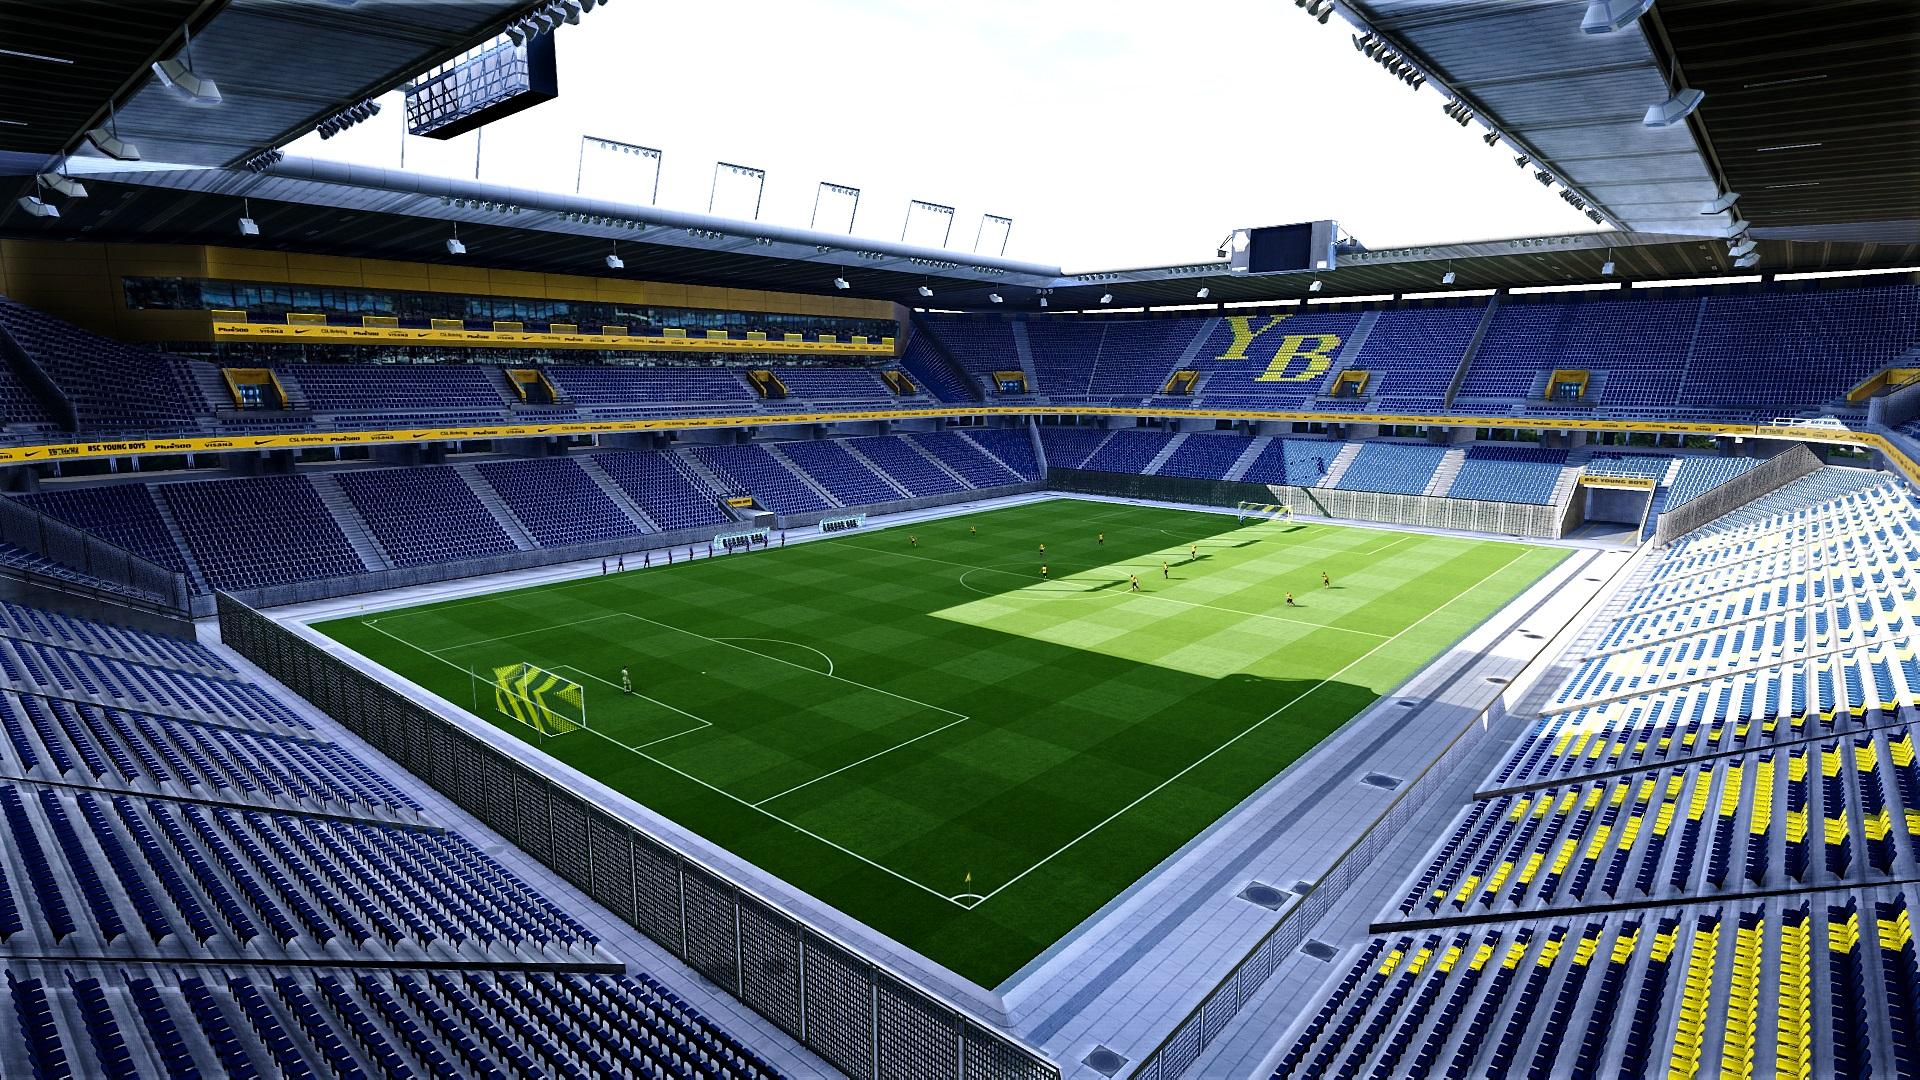 PES 2021 Stade de Suisse (BSC Young Boys)